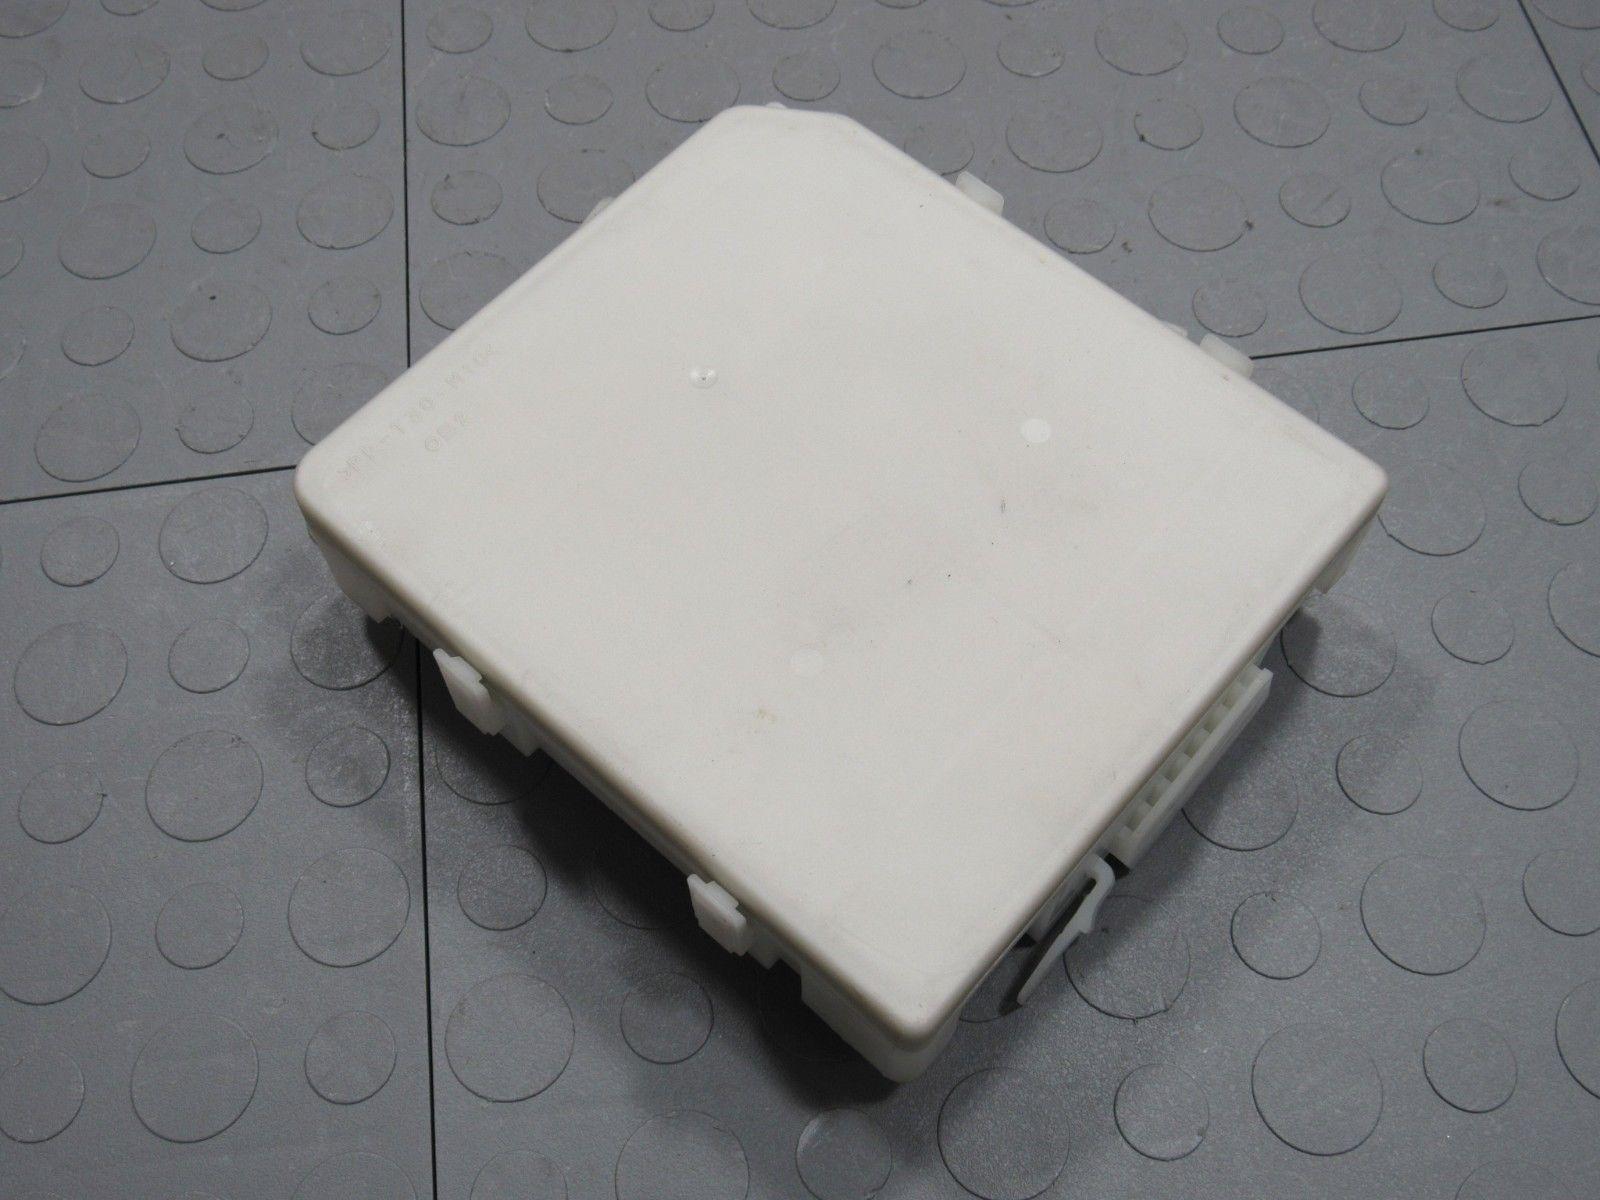 04 06 Titan Armada Xterra Qx56 Ipdm Bcm Body Module Fuse Box 284b6 Dryer 7s002 Ge